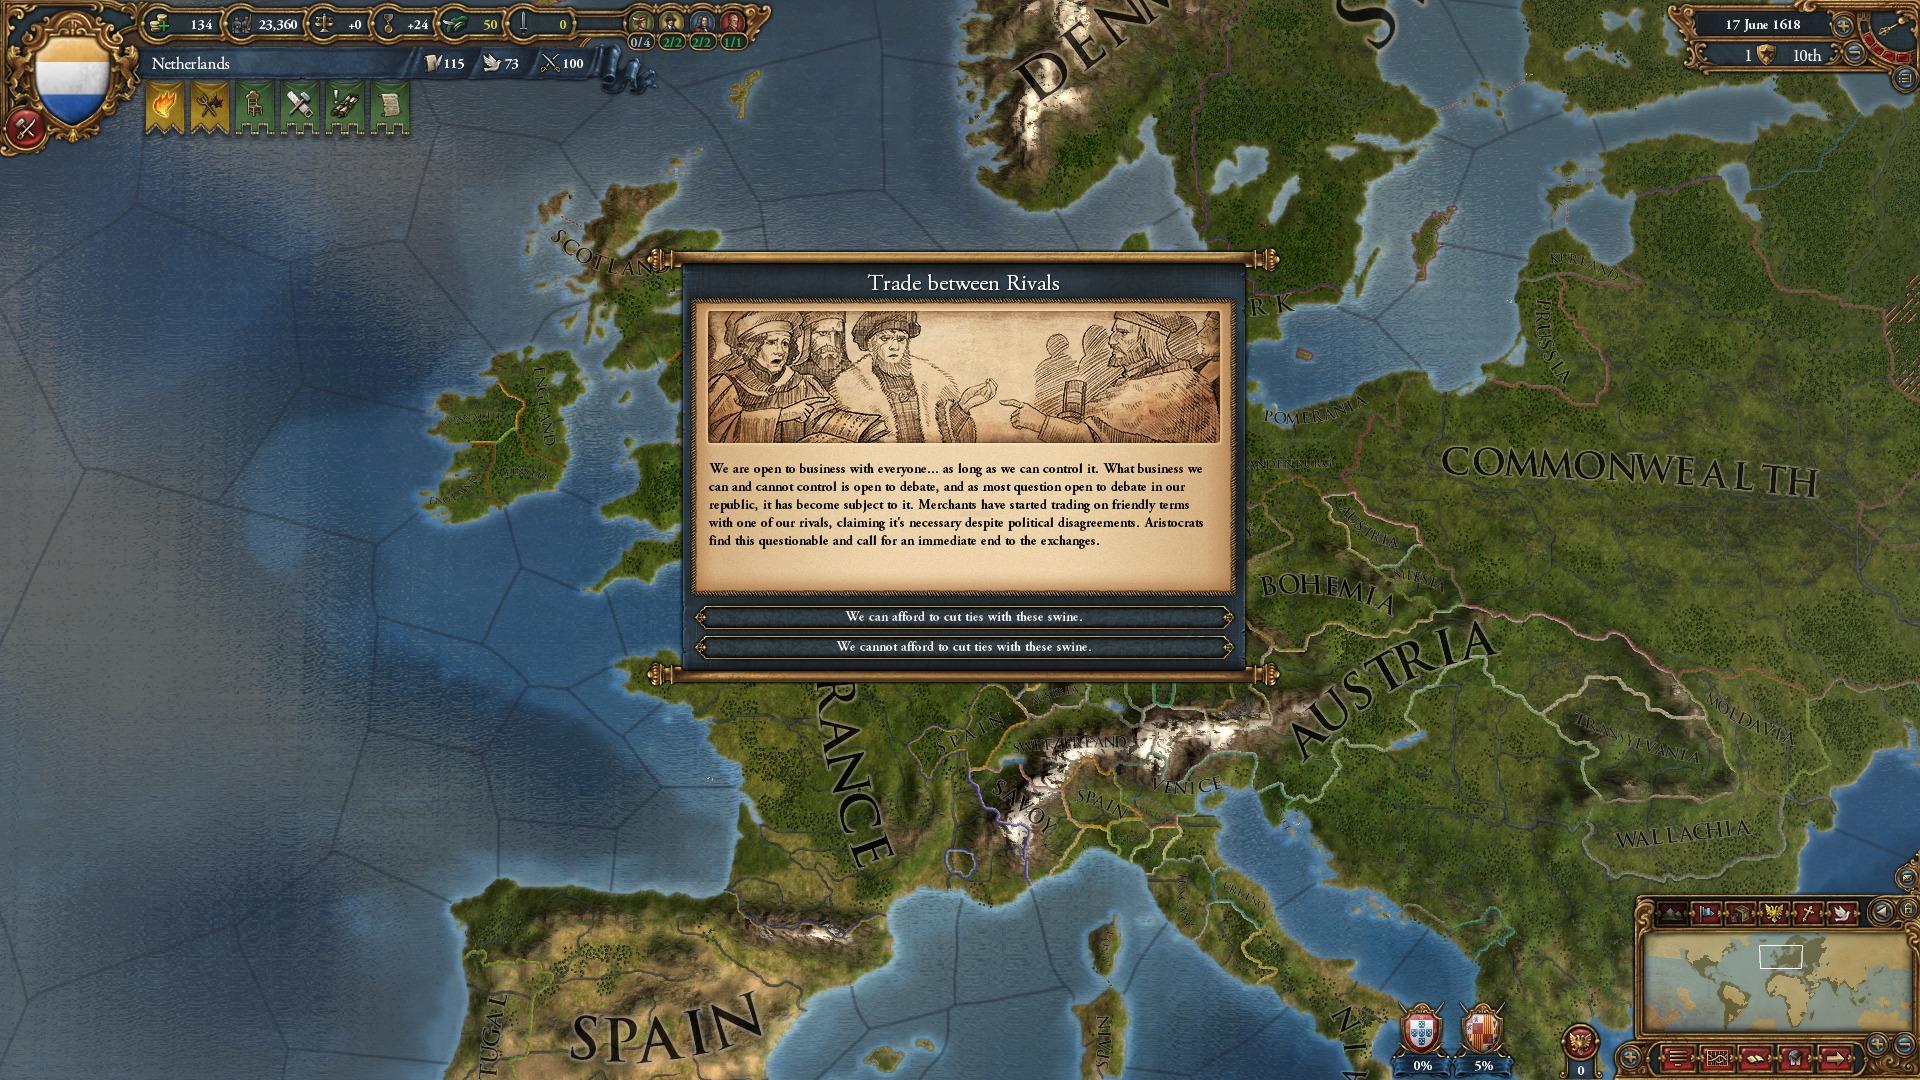 Paradox Interactive reveals third expansion, Res Publica